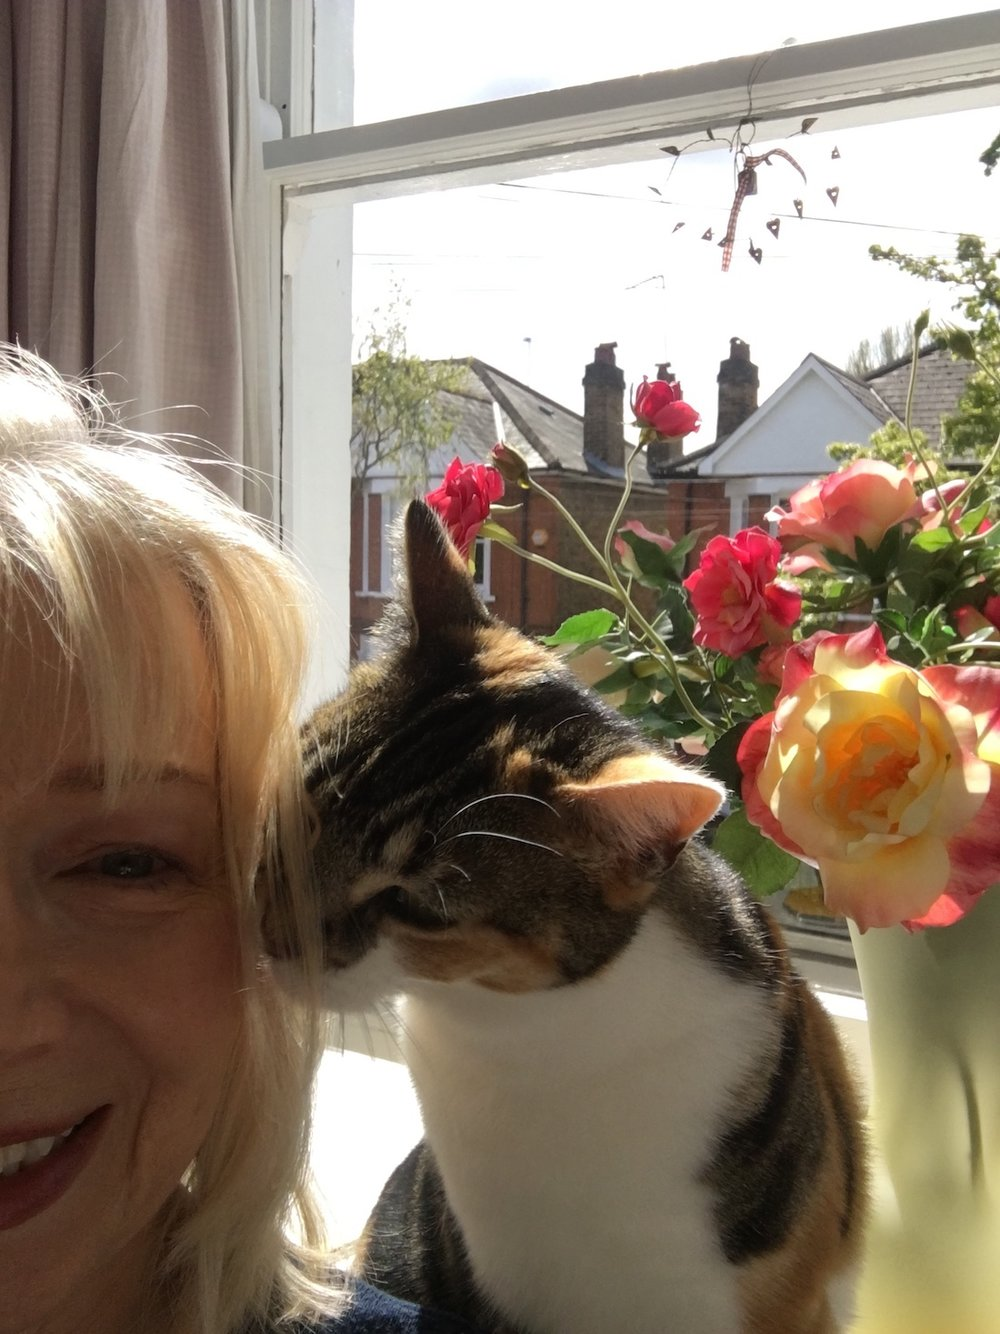 irenejuliawise-irene-wise-selfie-photo-with-cat copy.JPG